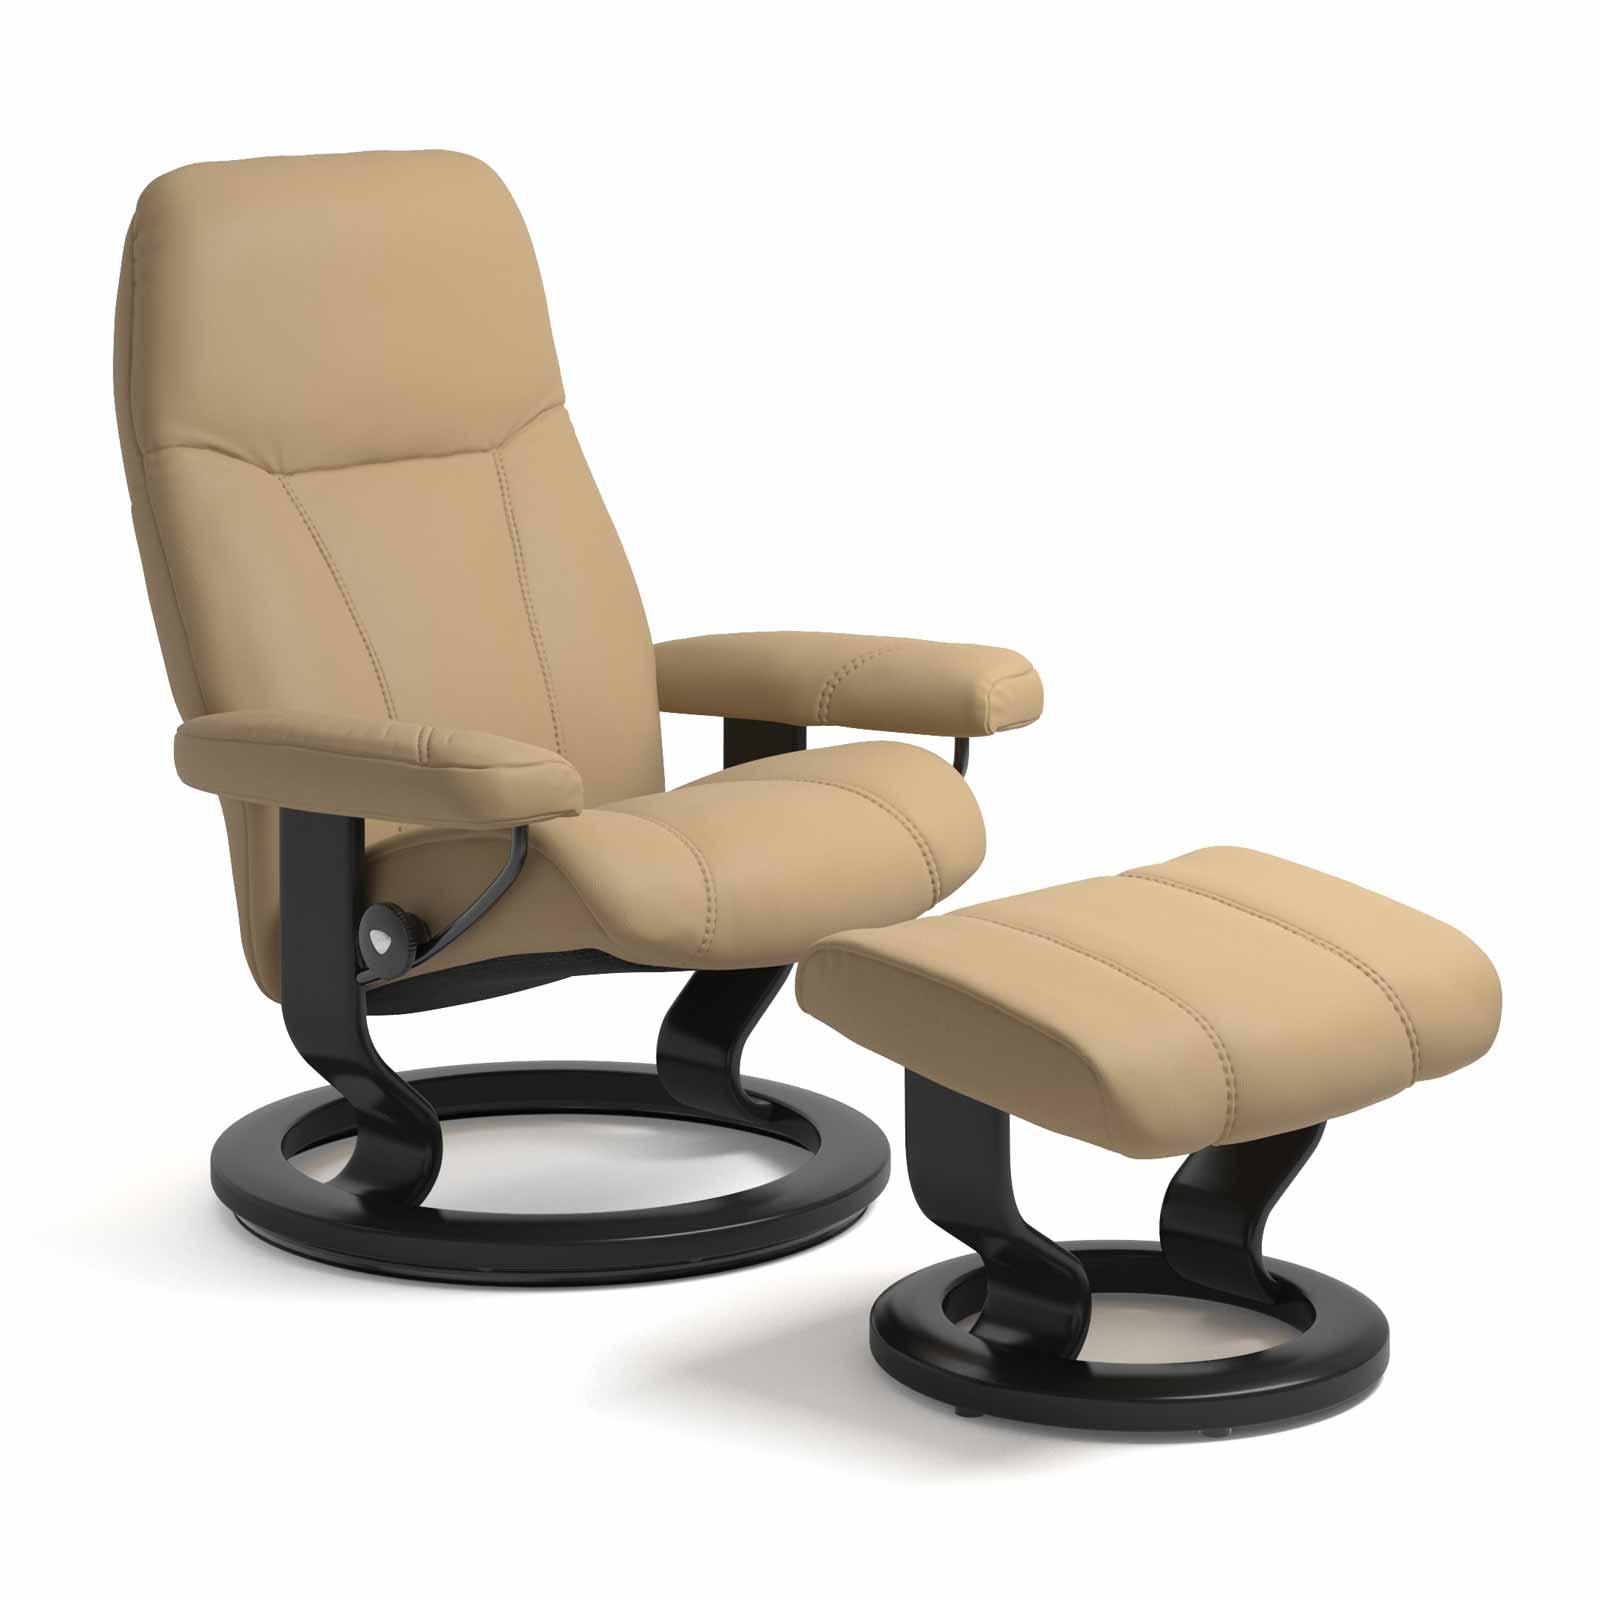 stressless consul classic sand mit hocker stressless shop. Black Bedroom Furniture Sets. Home Design Ideas